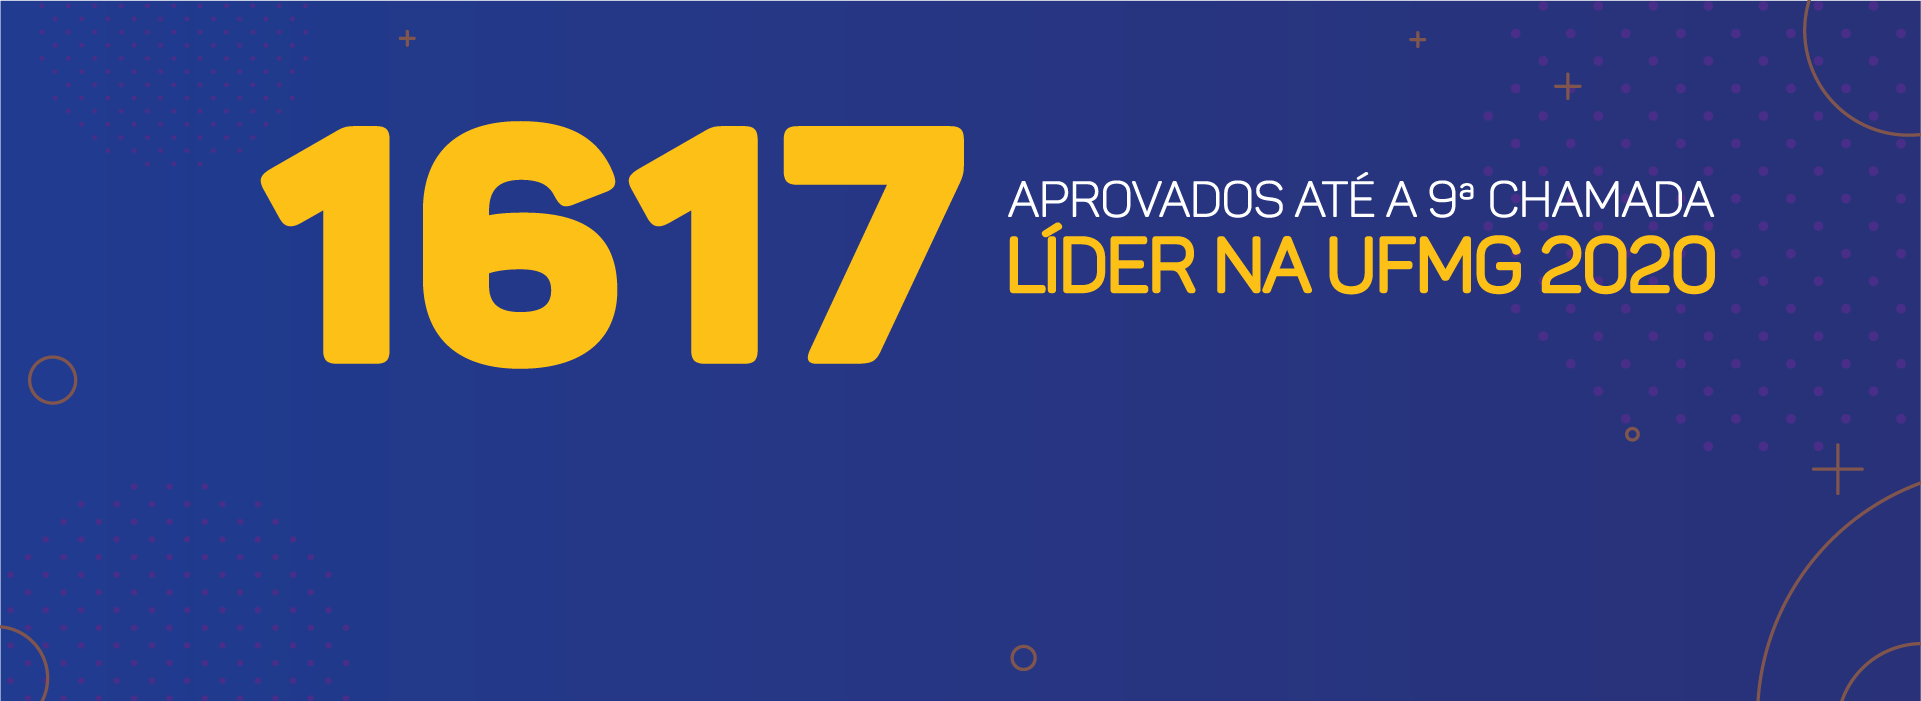 22-01 - Lista de Aprovados UFMG 2020_capa